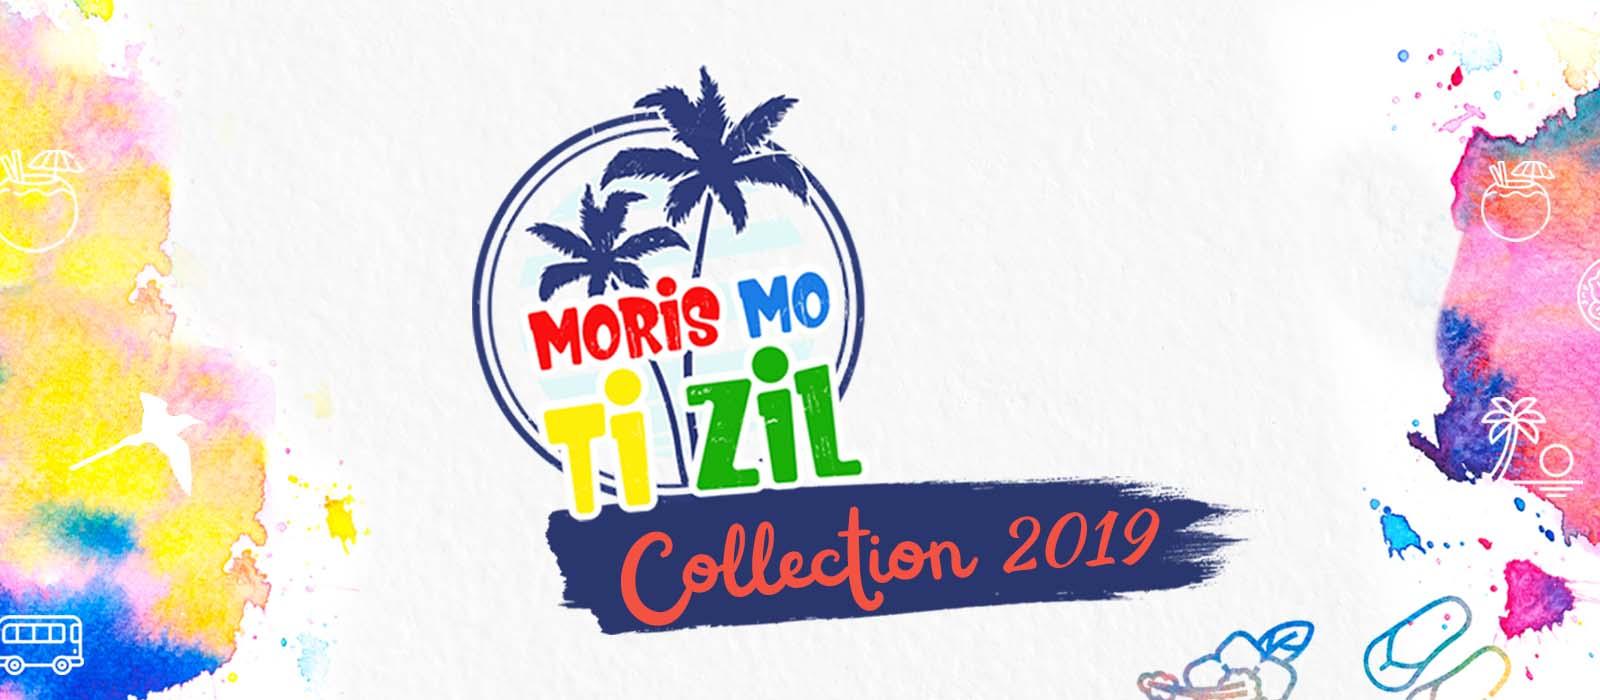 Morris mo ti zil collection 2019 banner